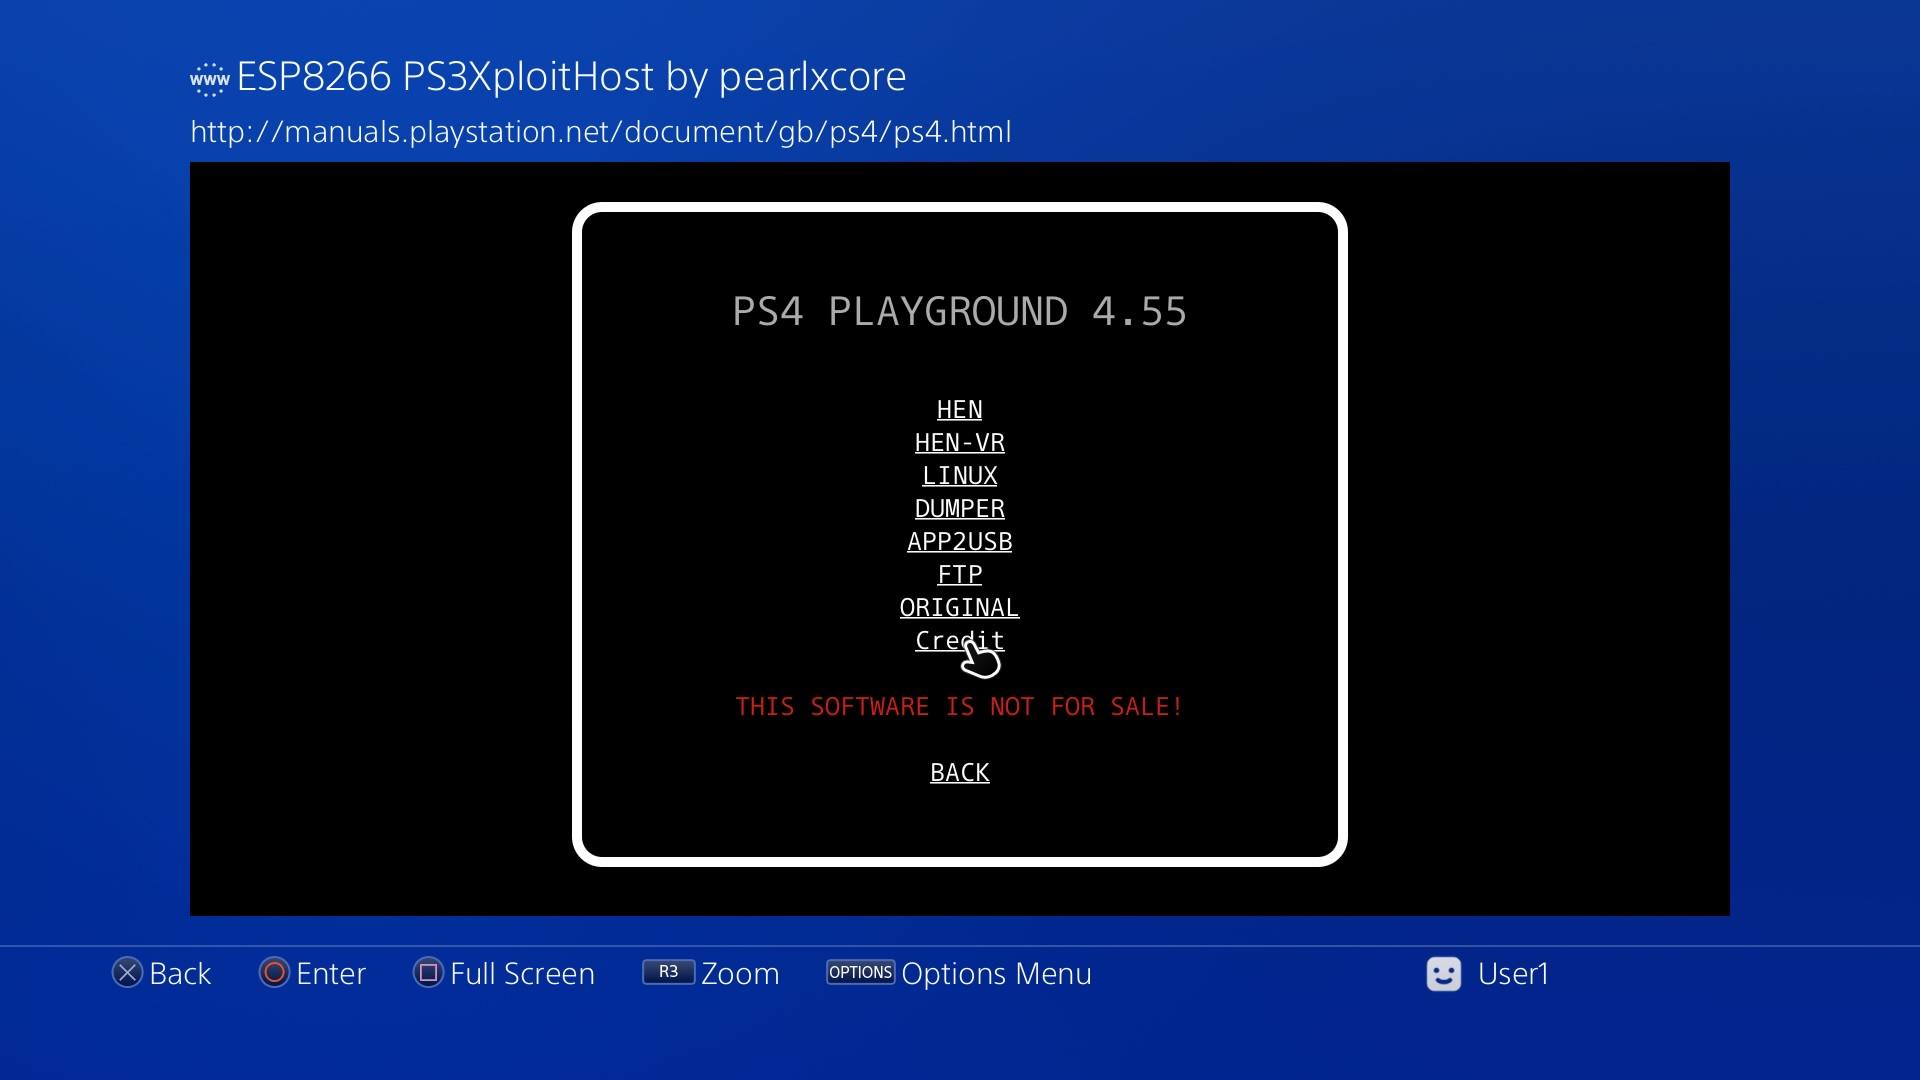 ESP8266-exploit-host/README md at master · pearlxcore/ESP8266